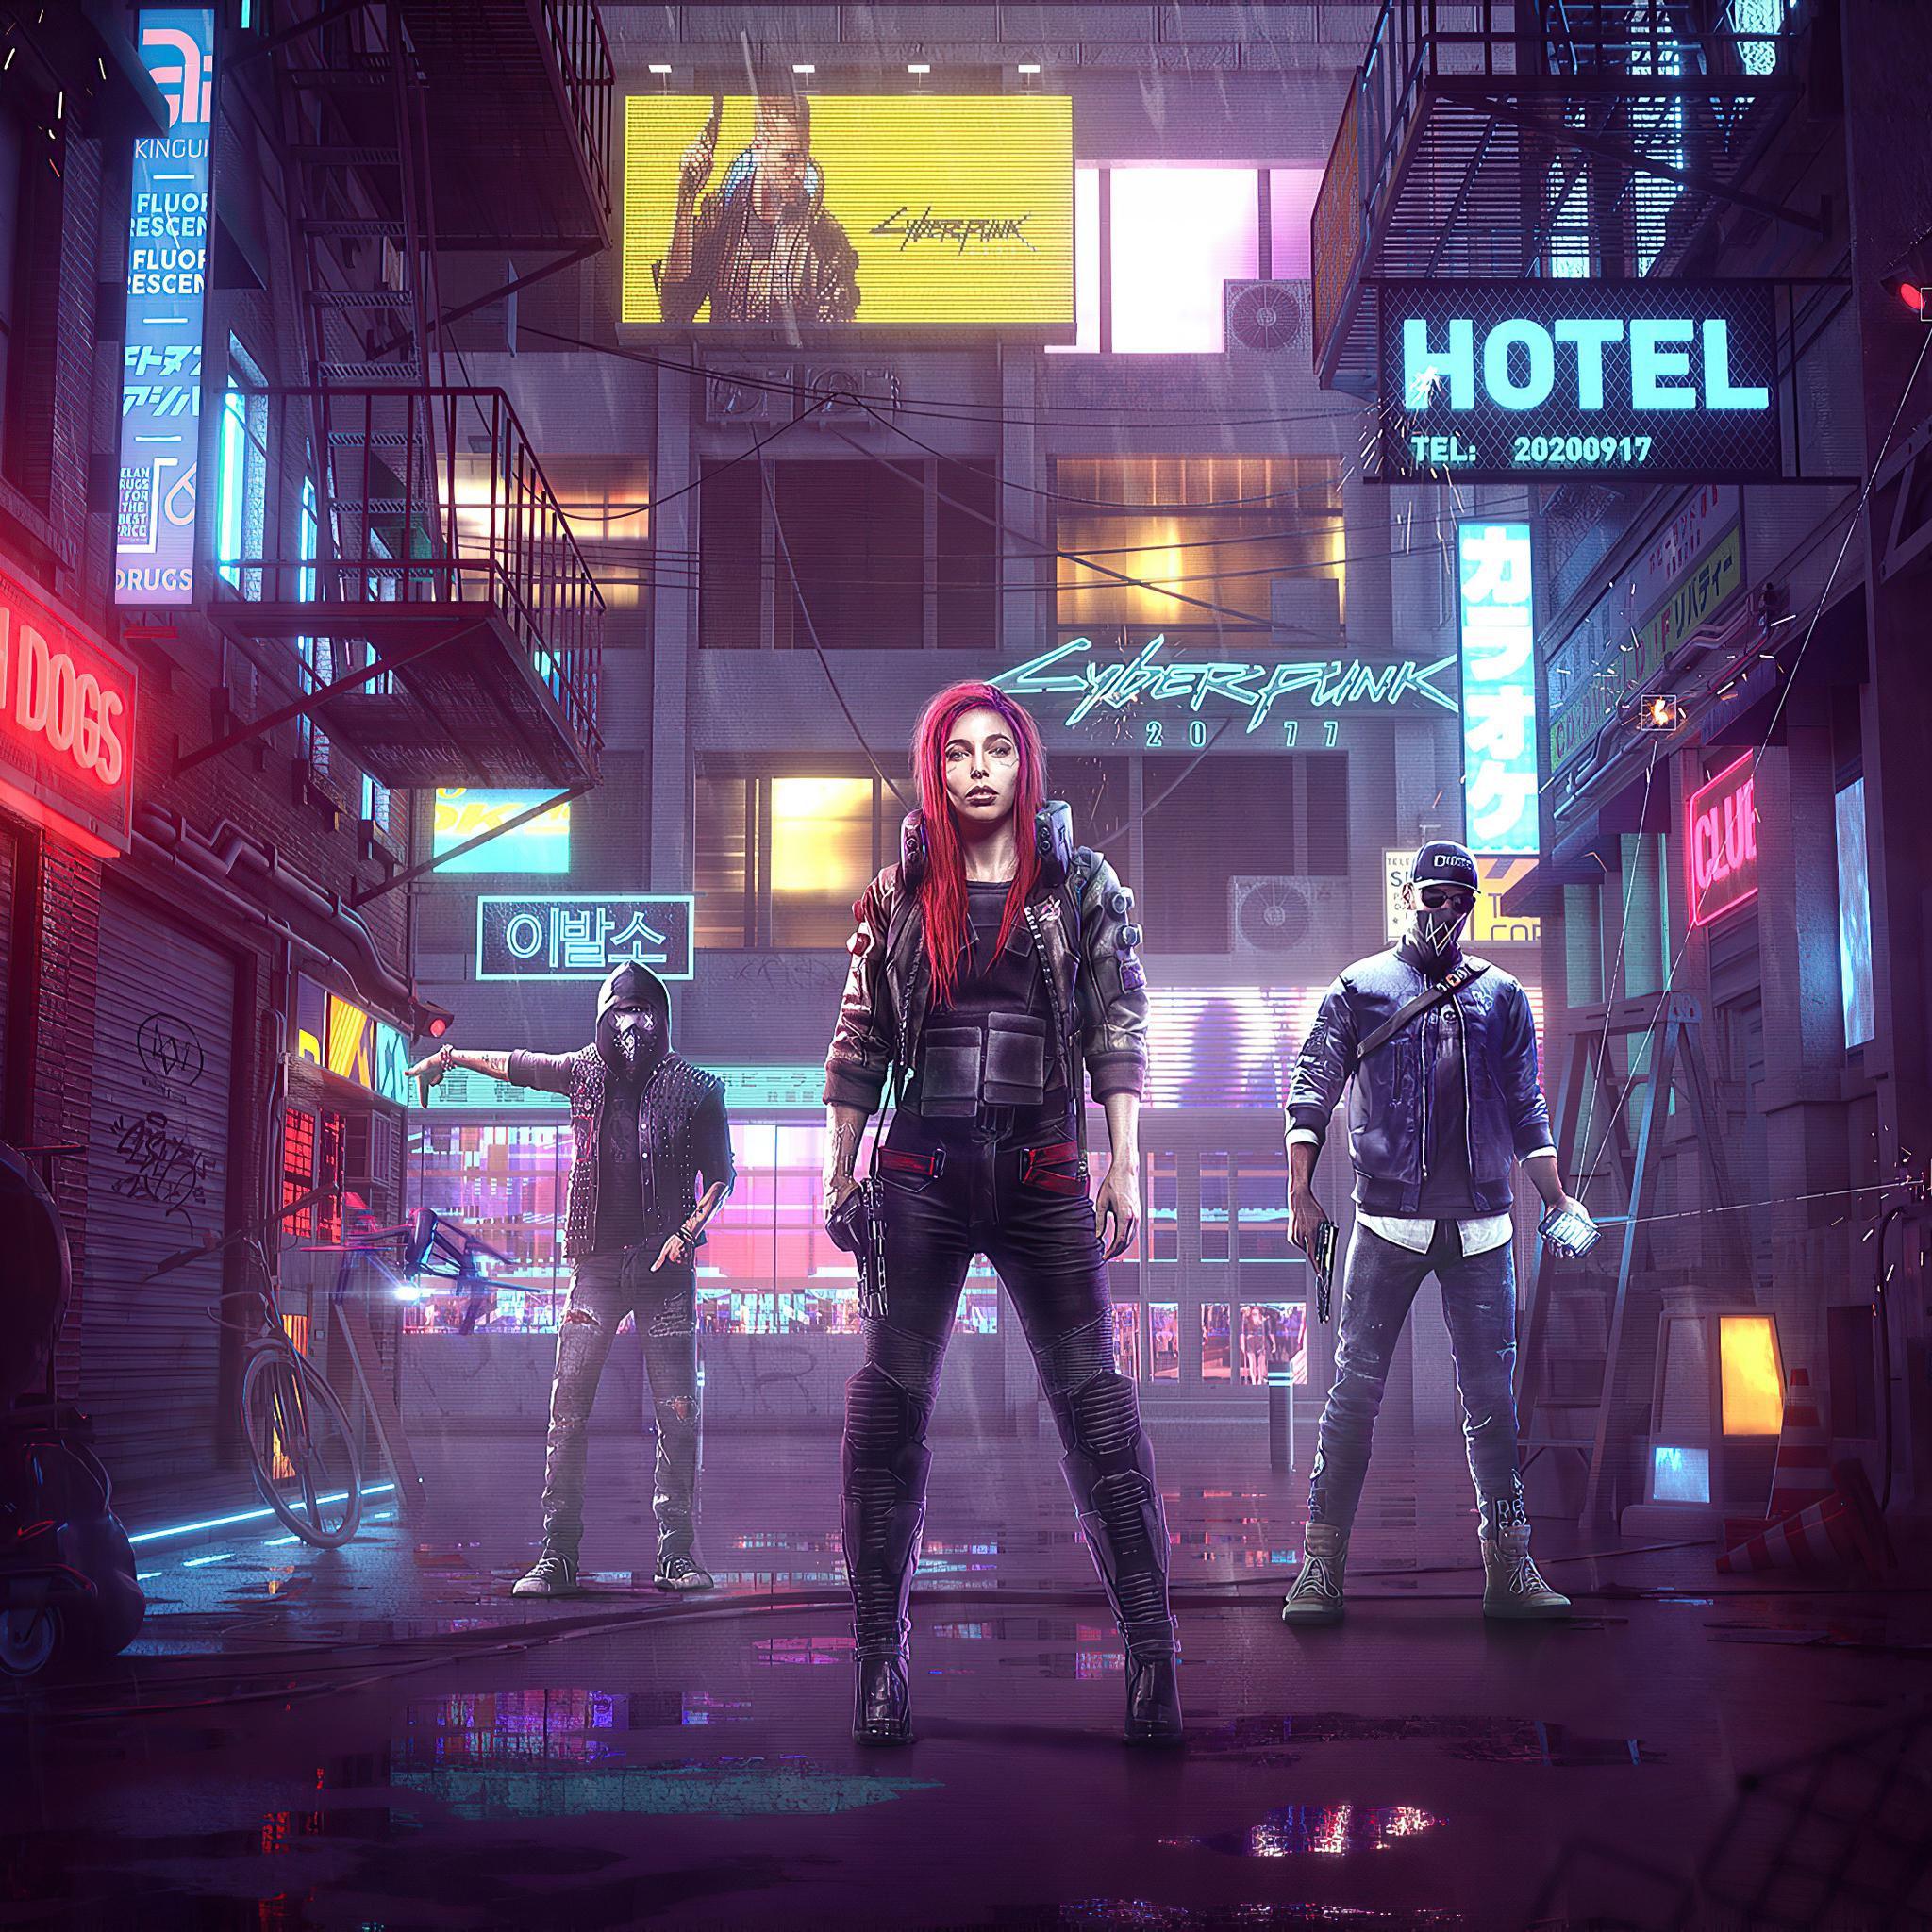 2048x2048 Cyberpunk 2077 4k 2020 Game Ipad Air HD 4k ...